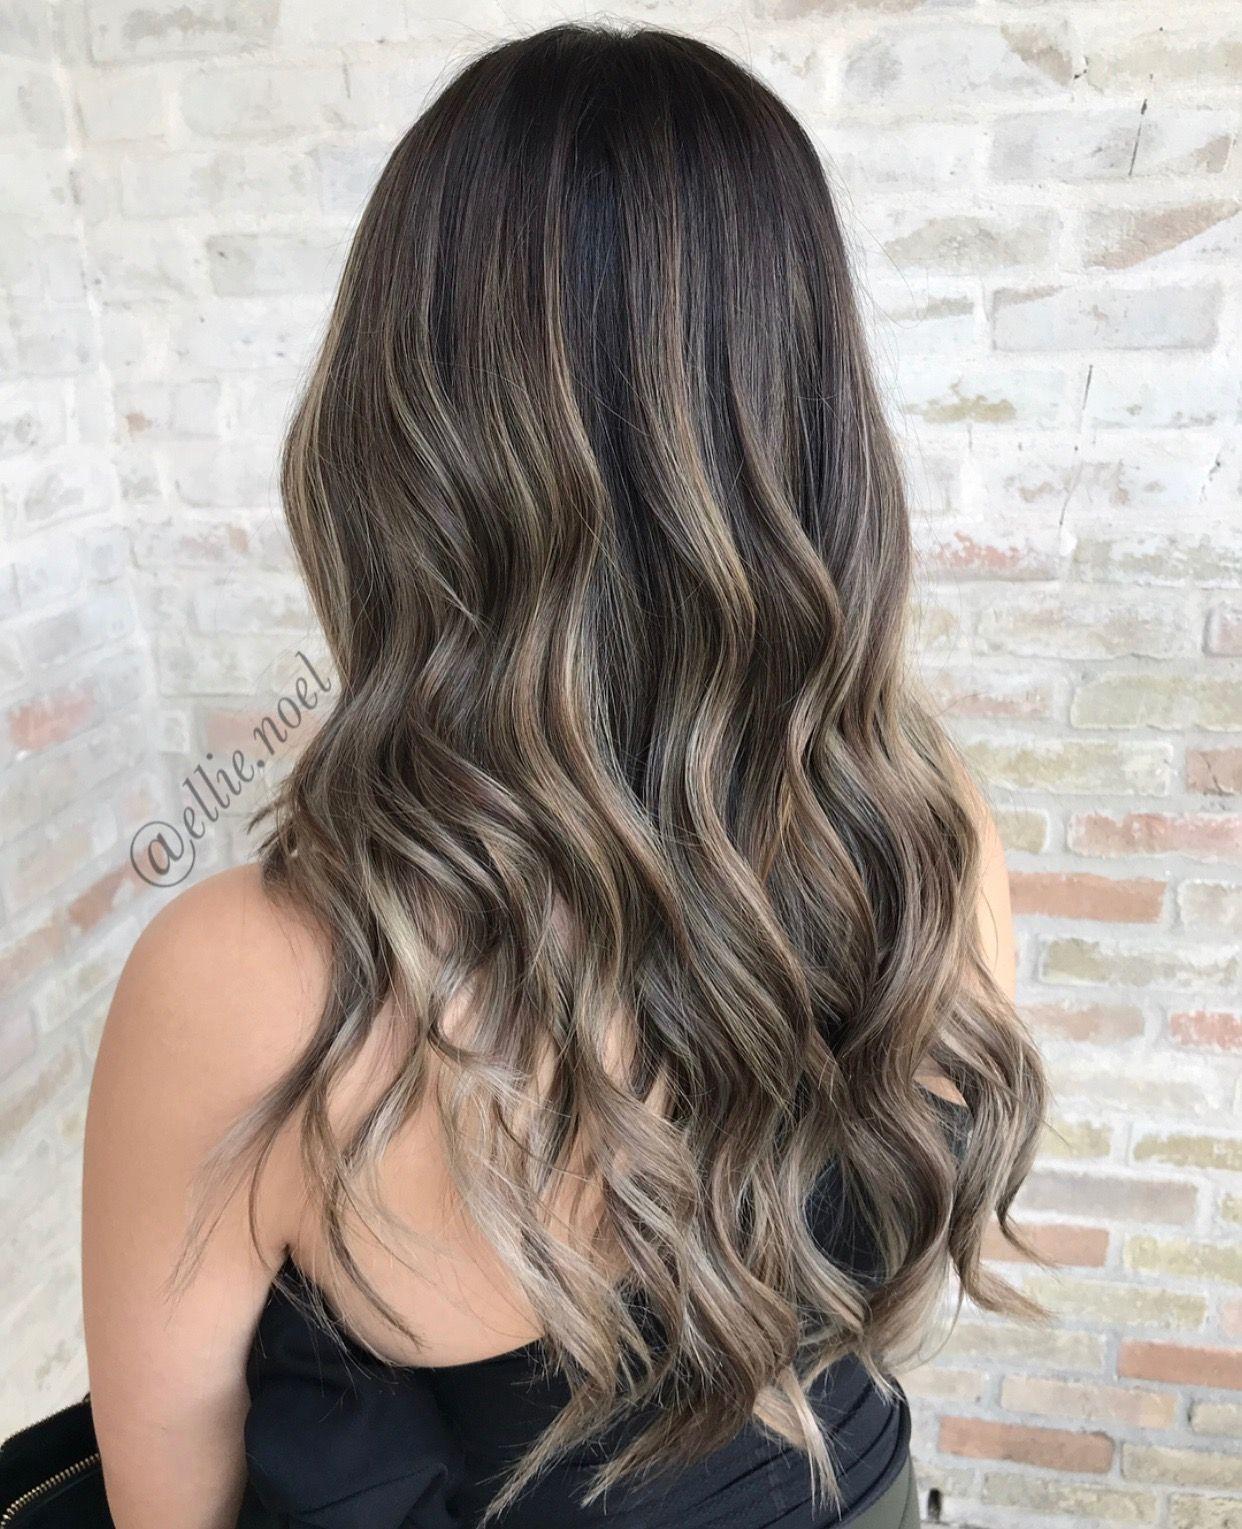 Beautiful Hand Painted Hair Balayage Perfect For Spring Painted Hair Balayage Hair Painting Ombre Hair Blonde